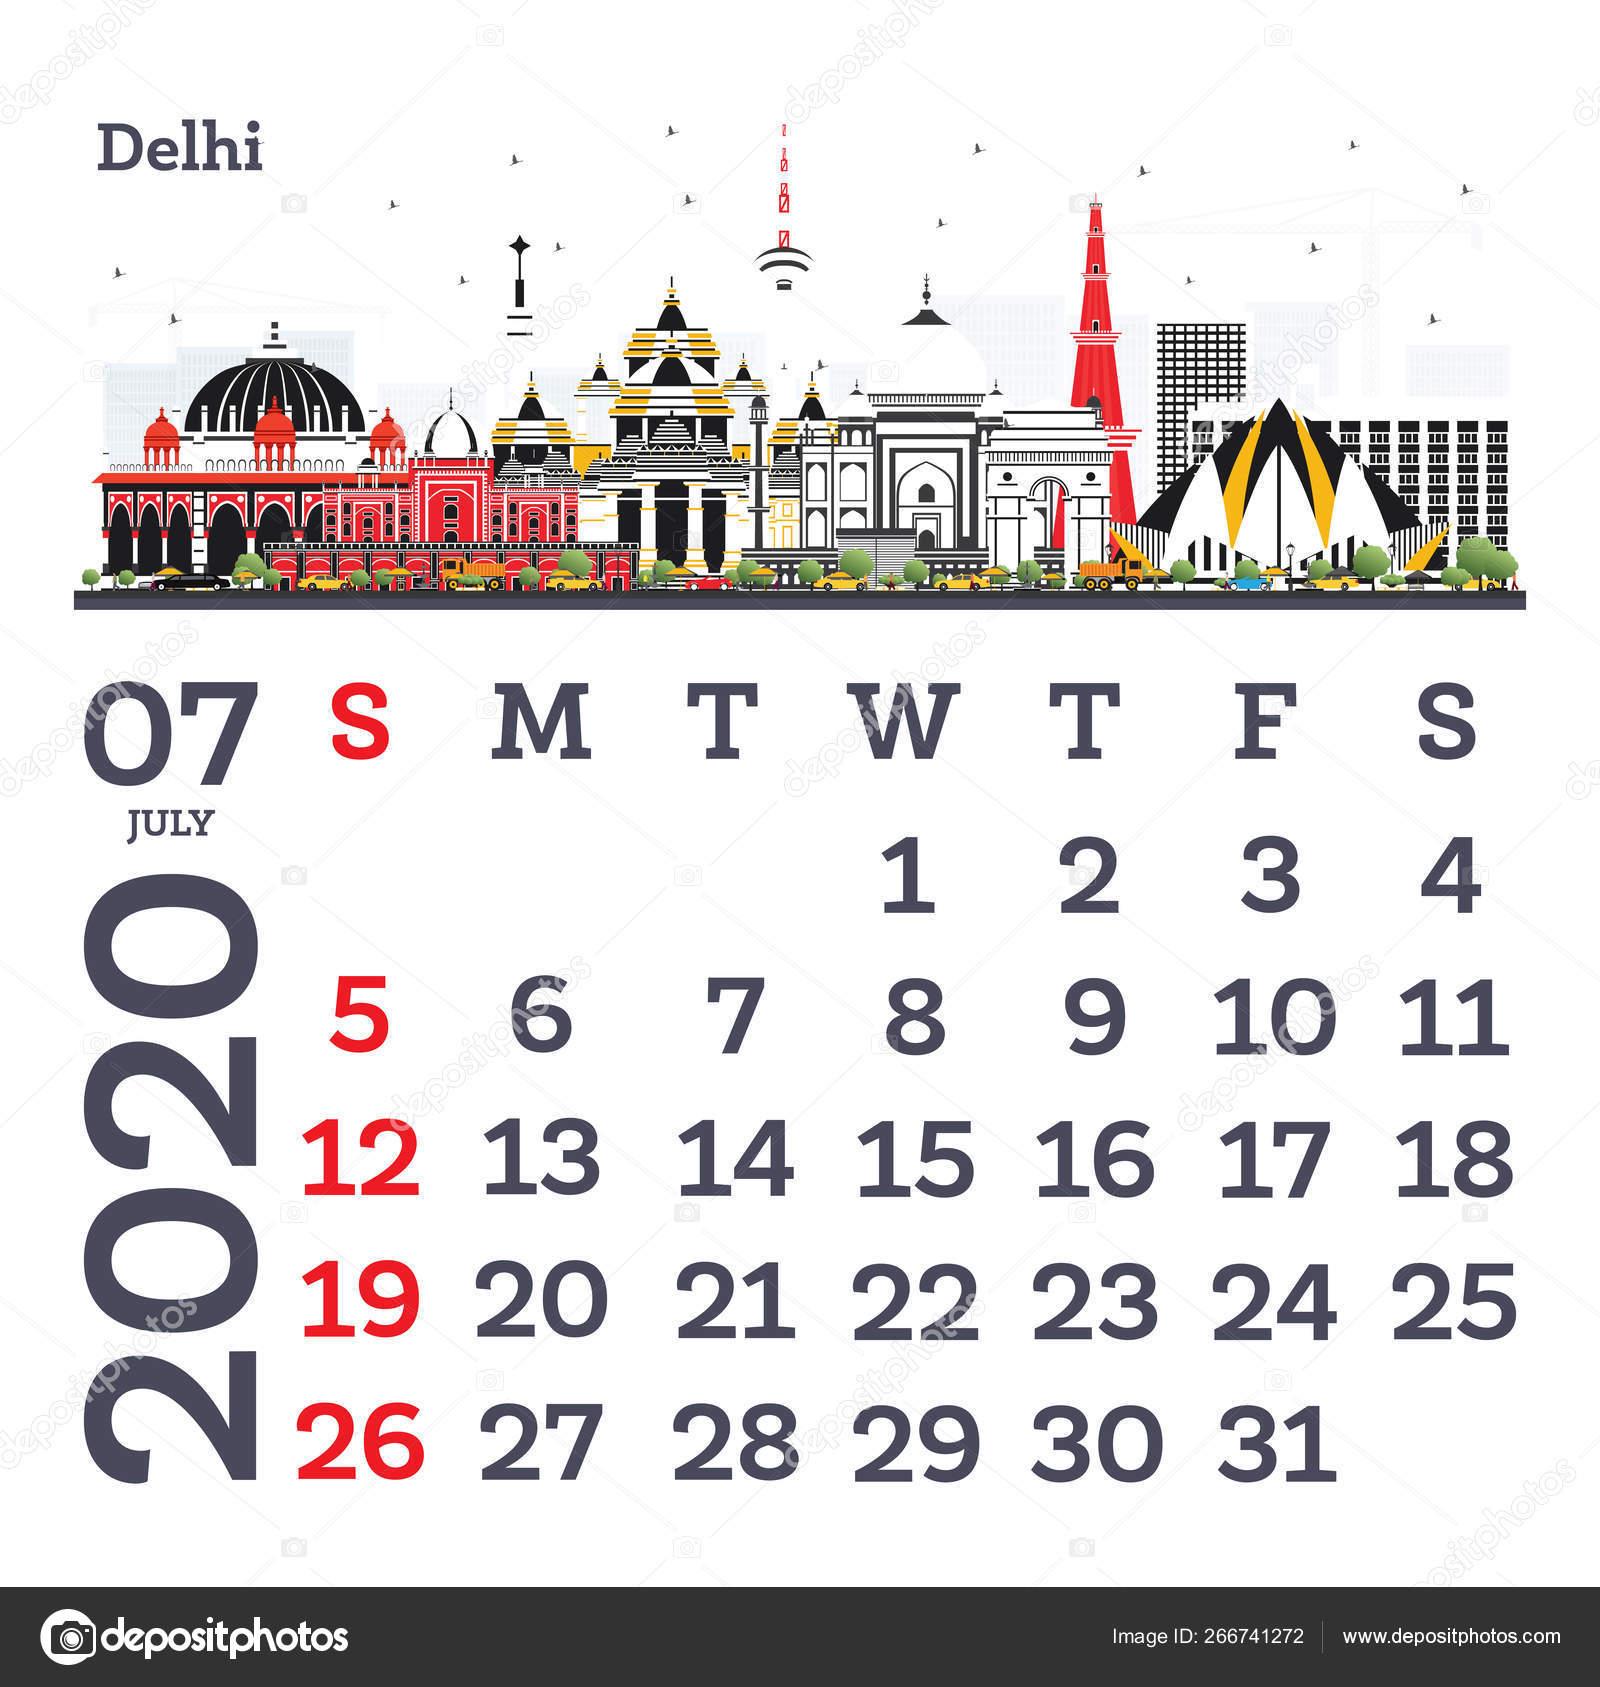 July 2020 Calendar Template With Delhi City Skyline